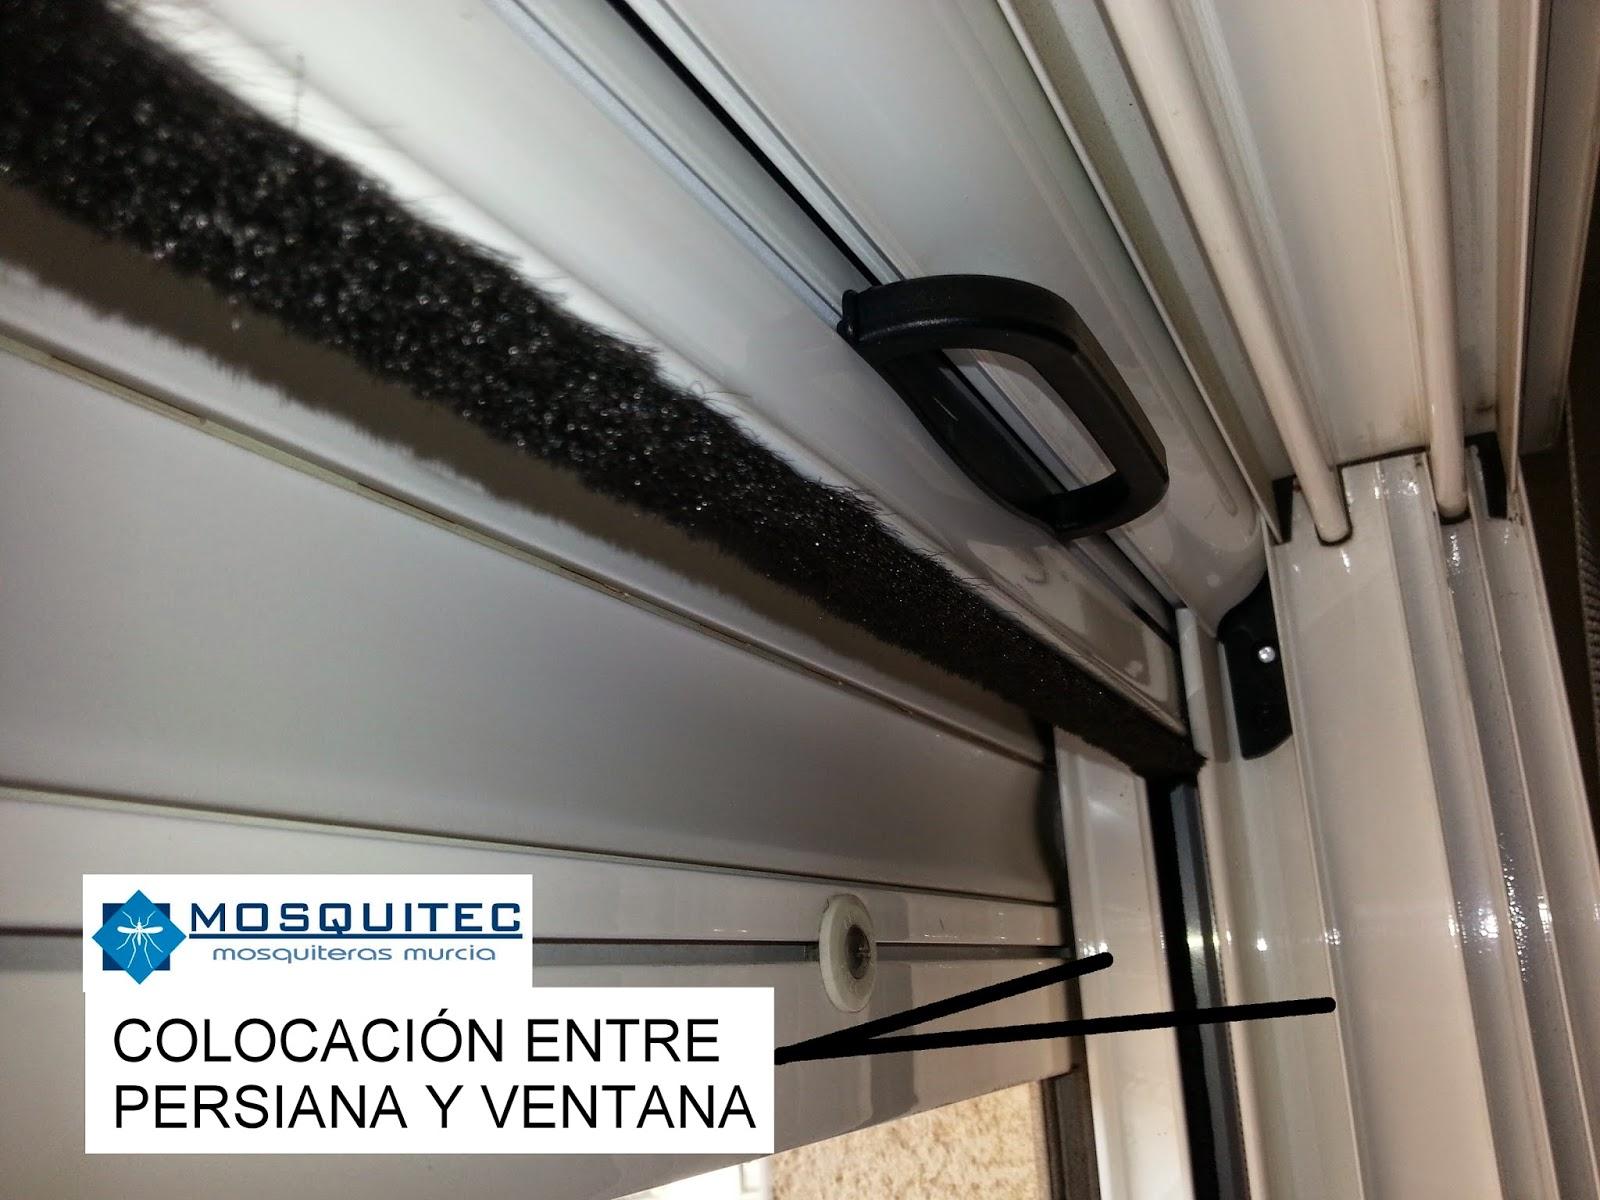 Mosquitera enrollable en ventanas con fijo mosquiteras - Colocar persiana enrollable ...